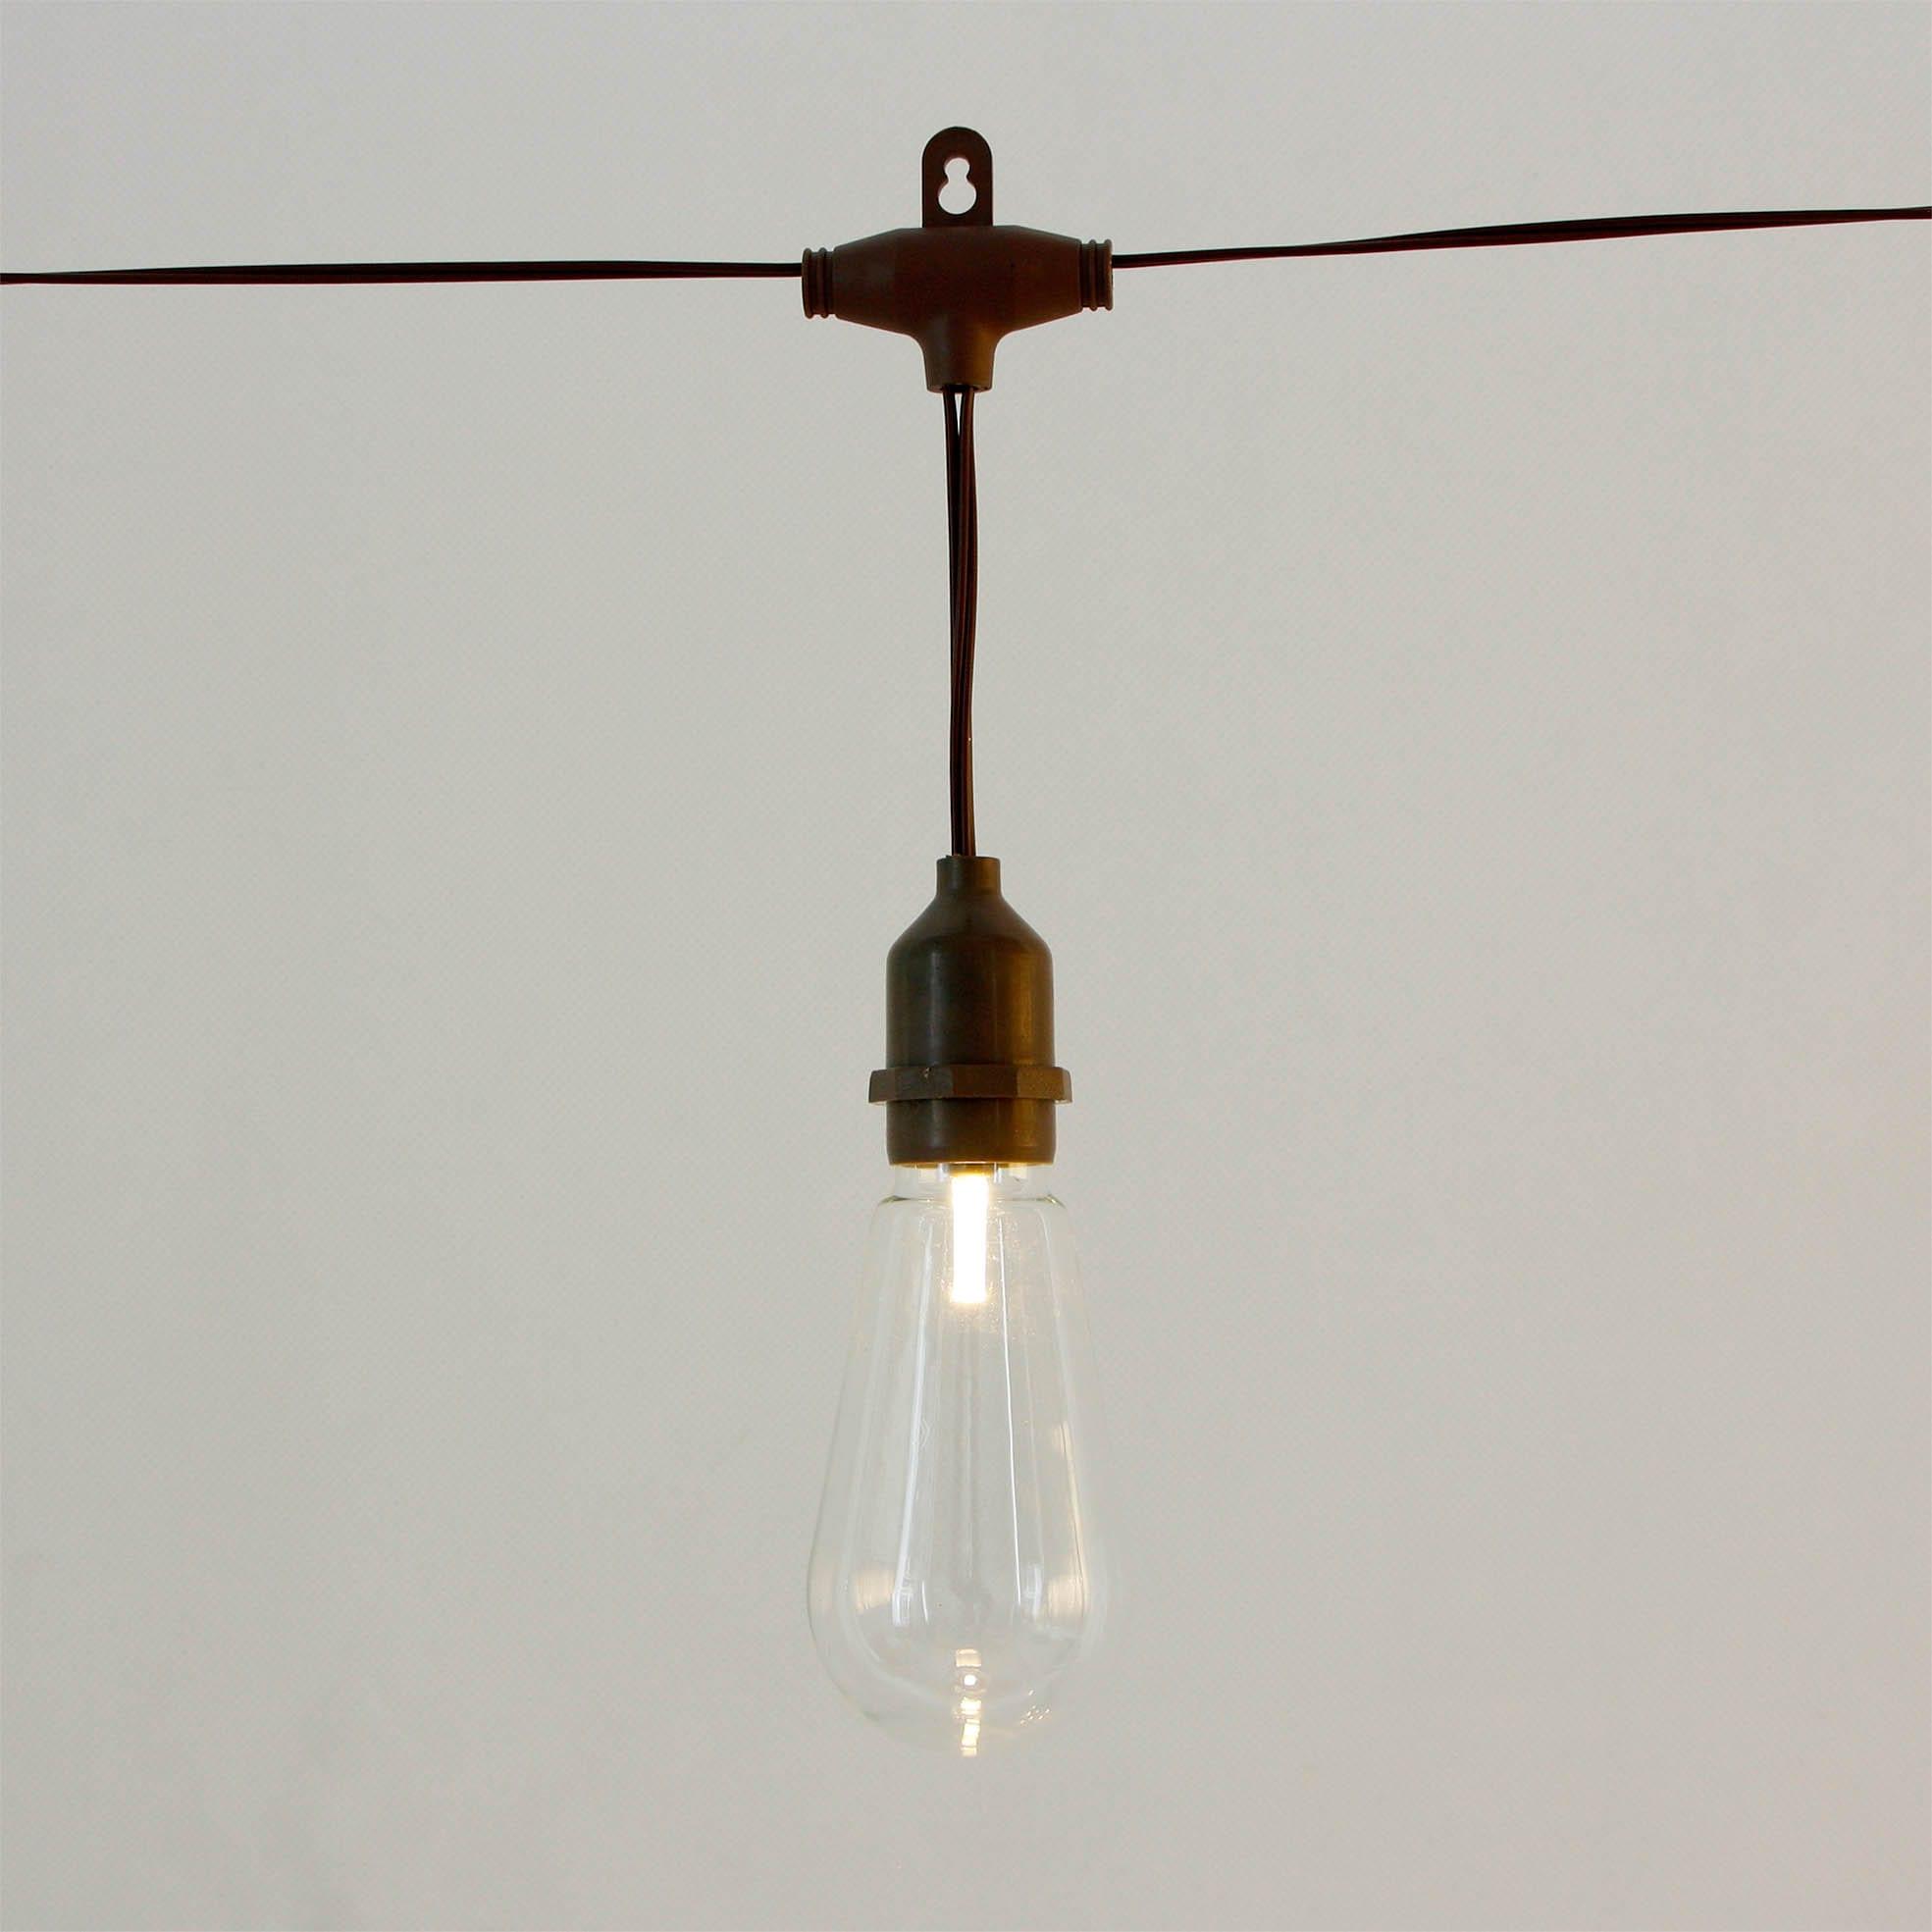 Decorative Umbrella Lights  MYHH09064-SO(C) Featured Image